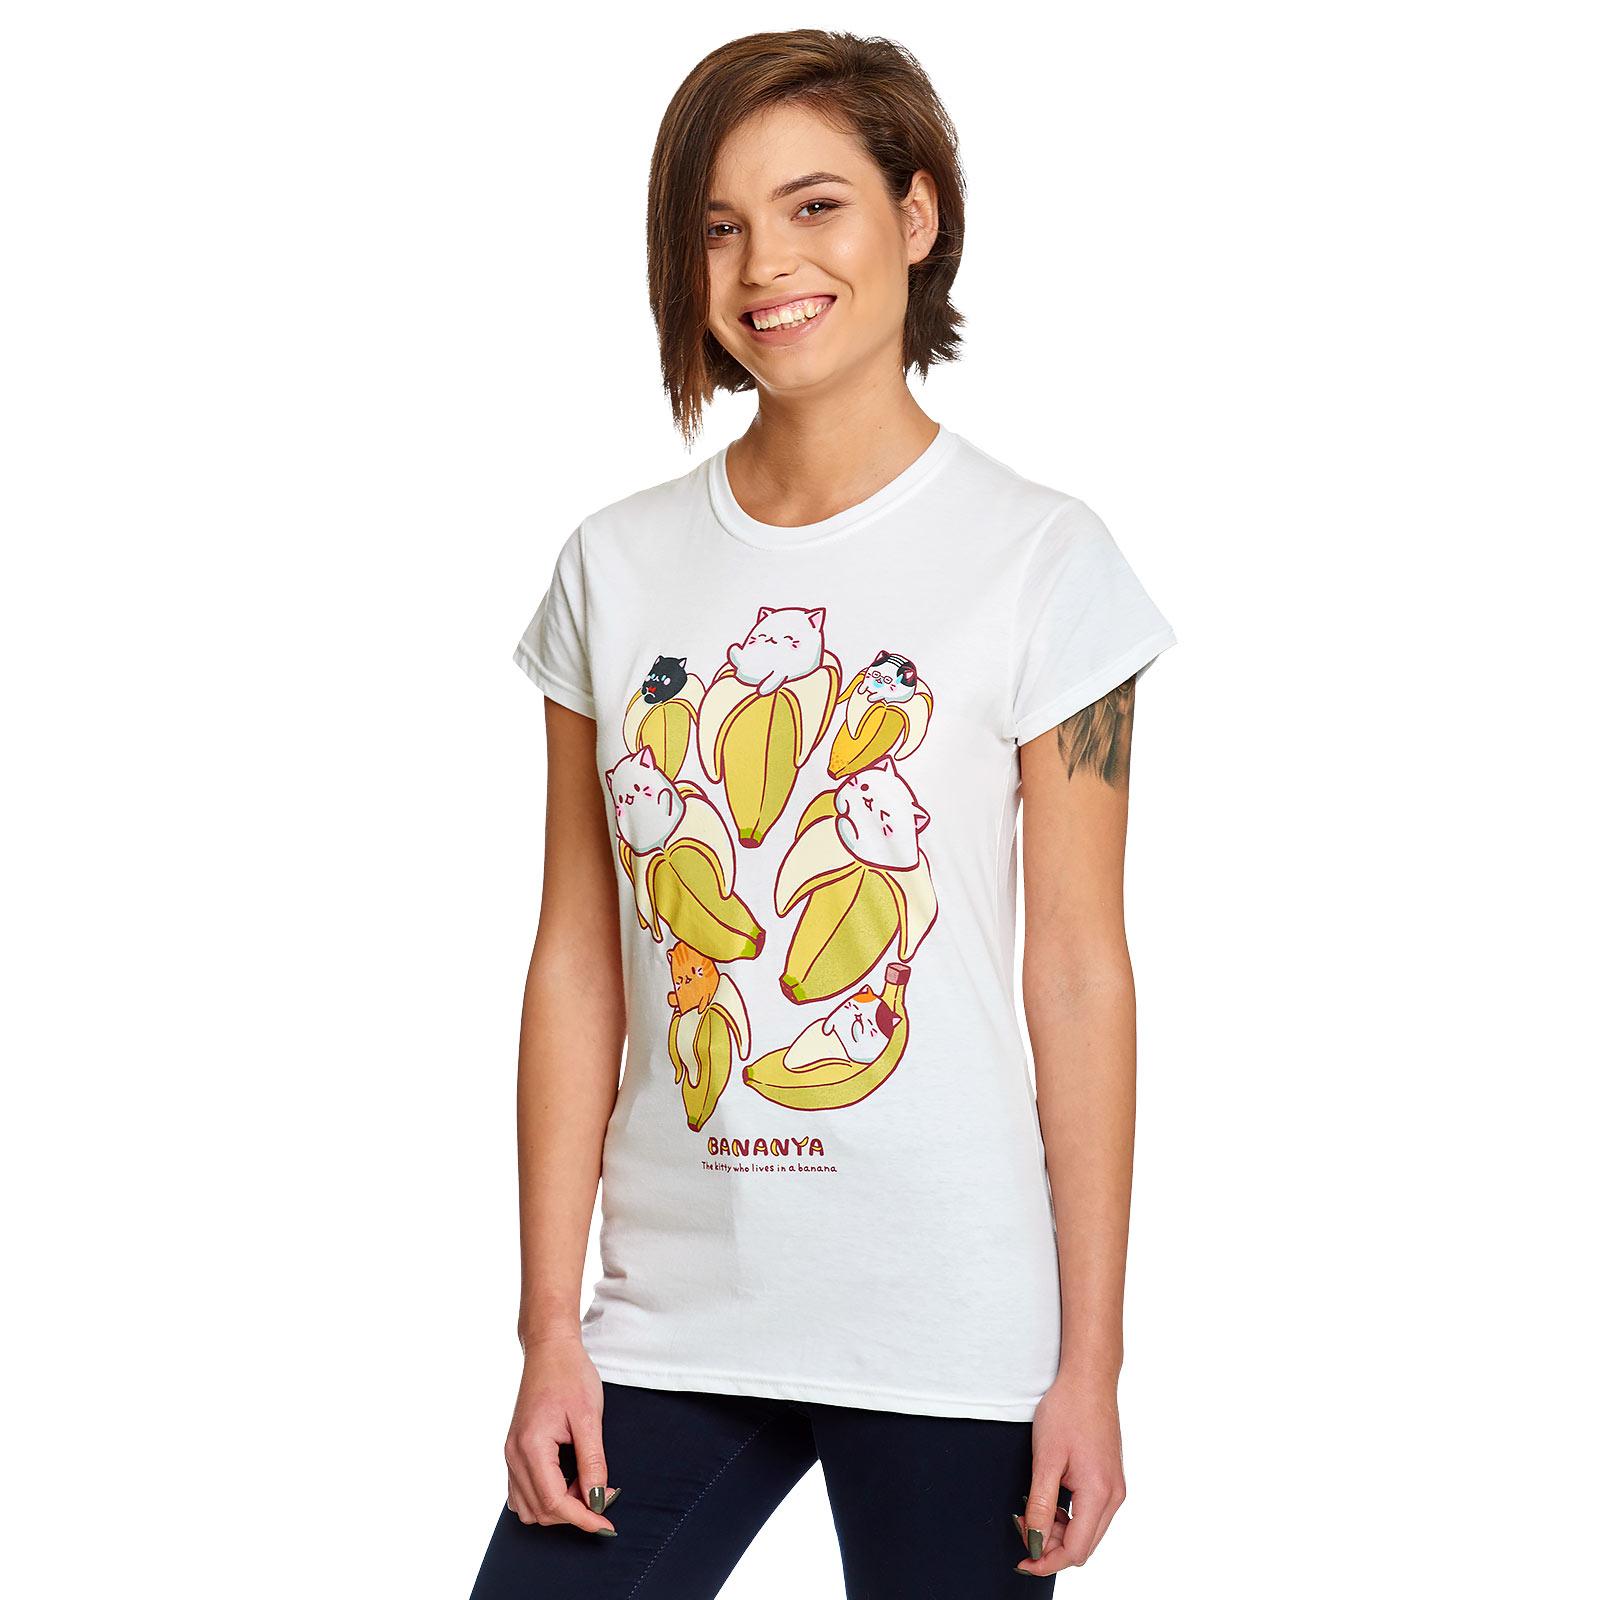 Bananya - Characters T-Shirt Damen weiß